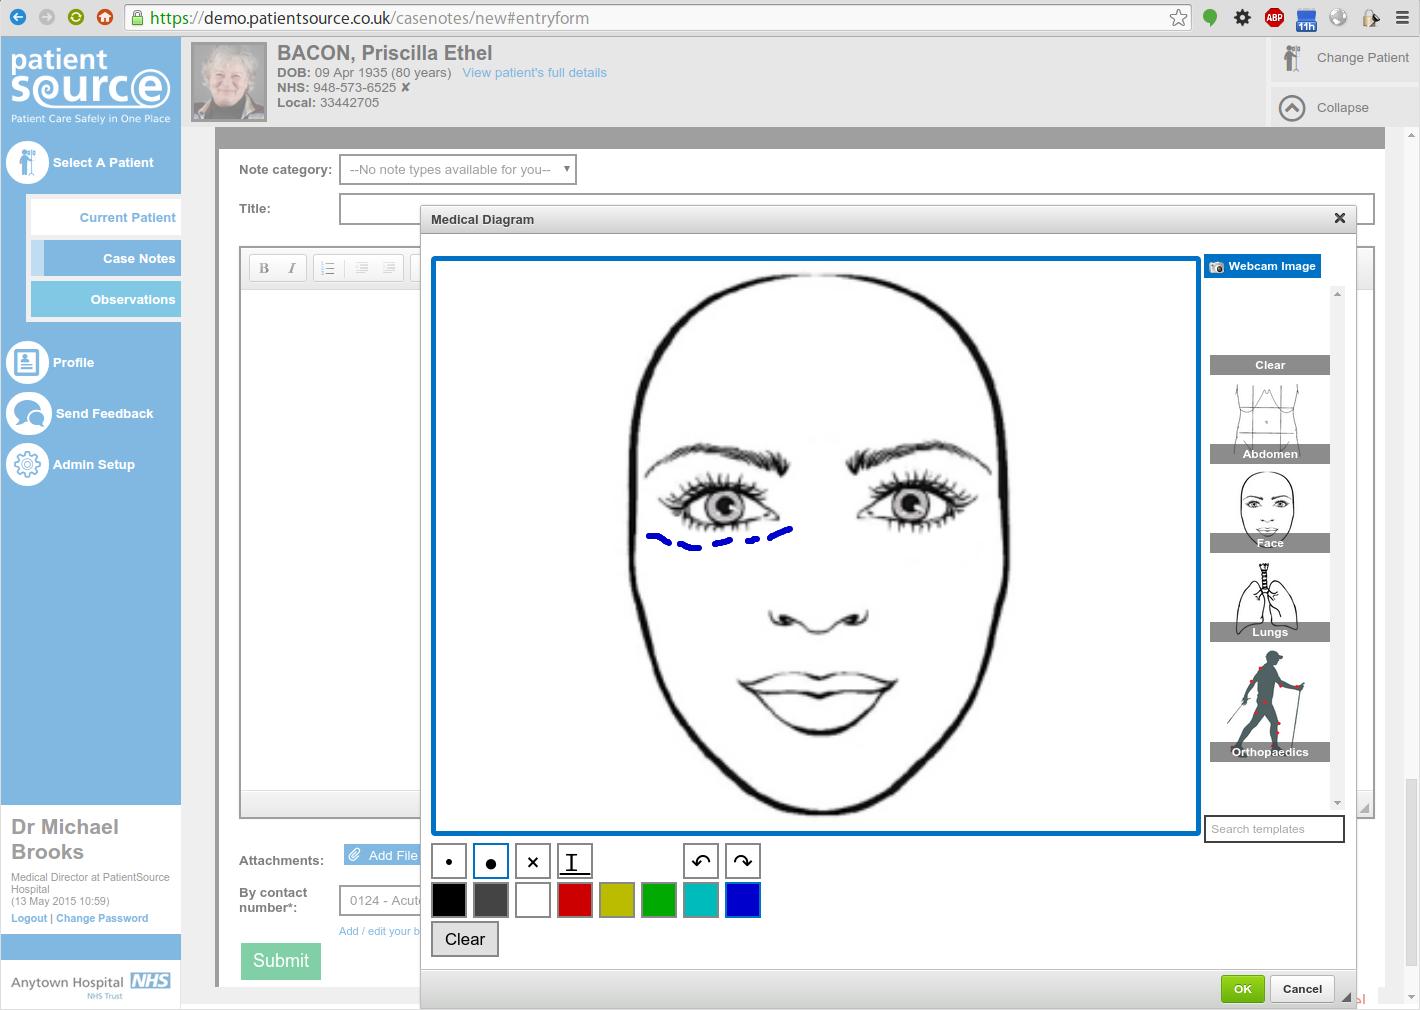 eCaseNotes template sketching